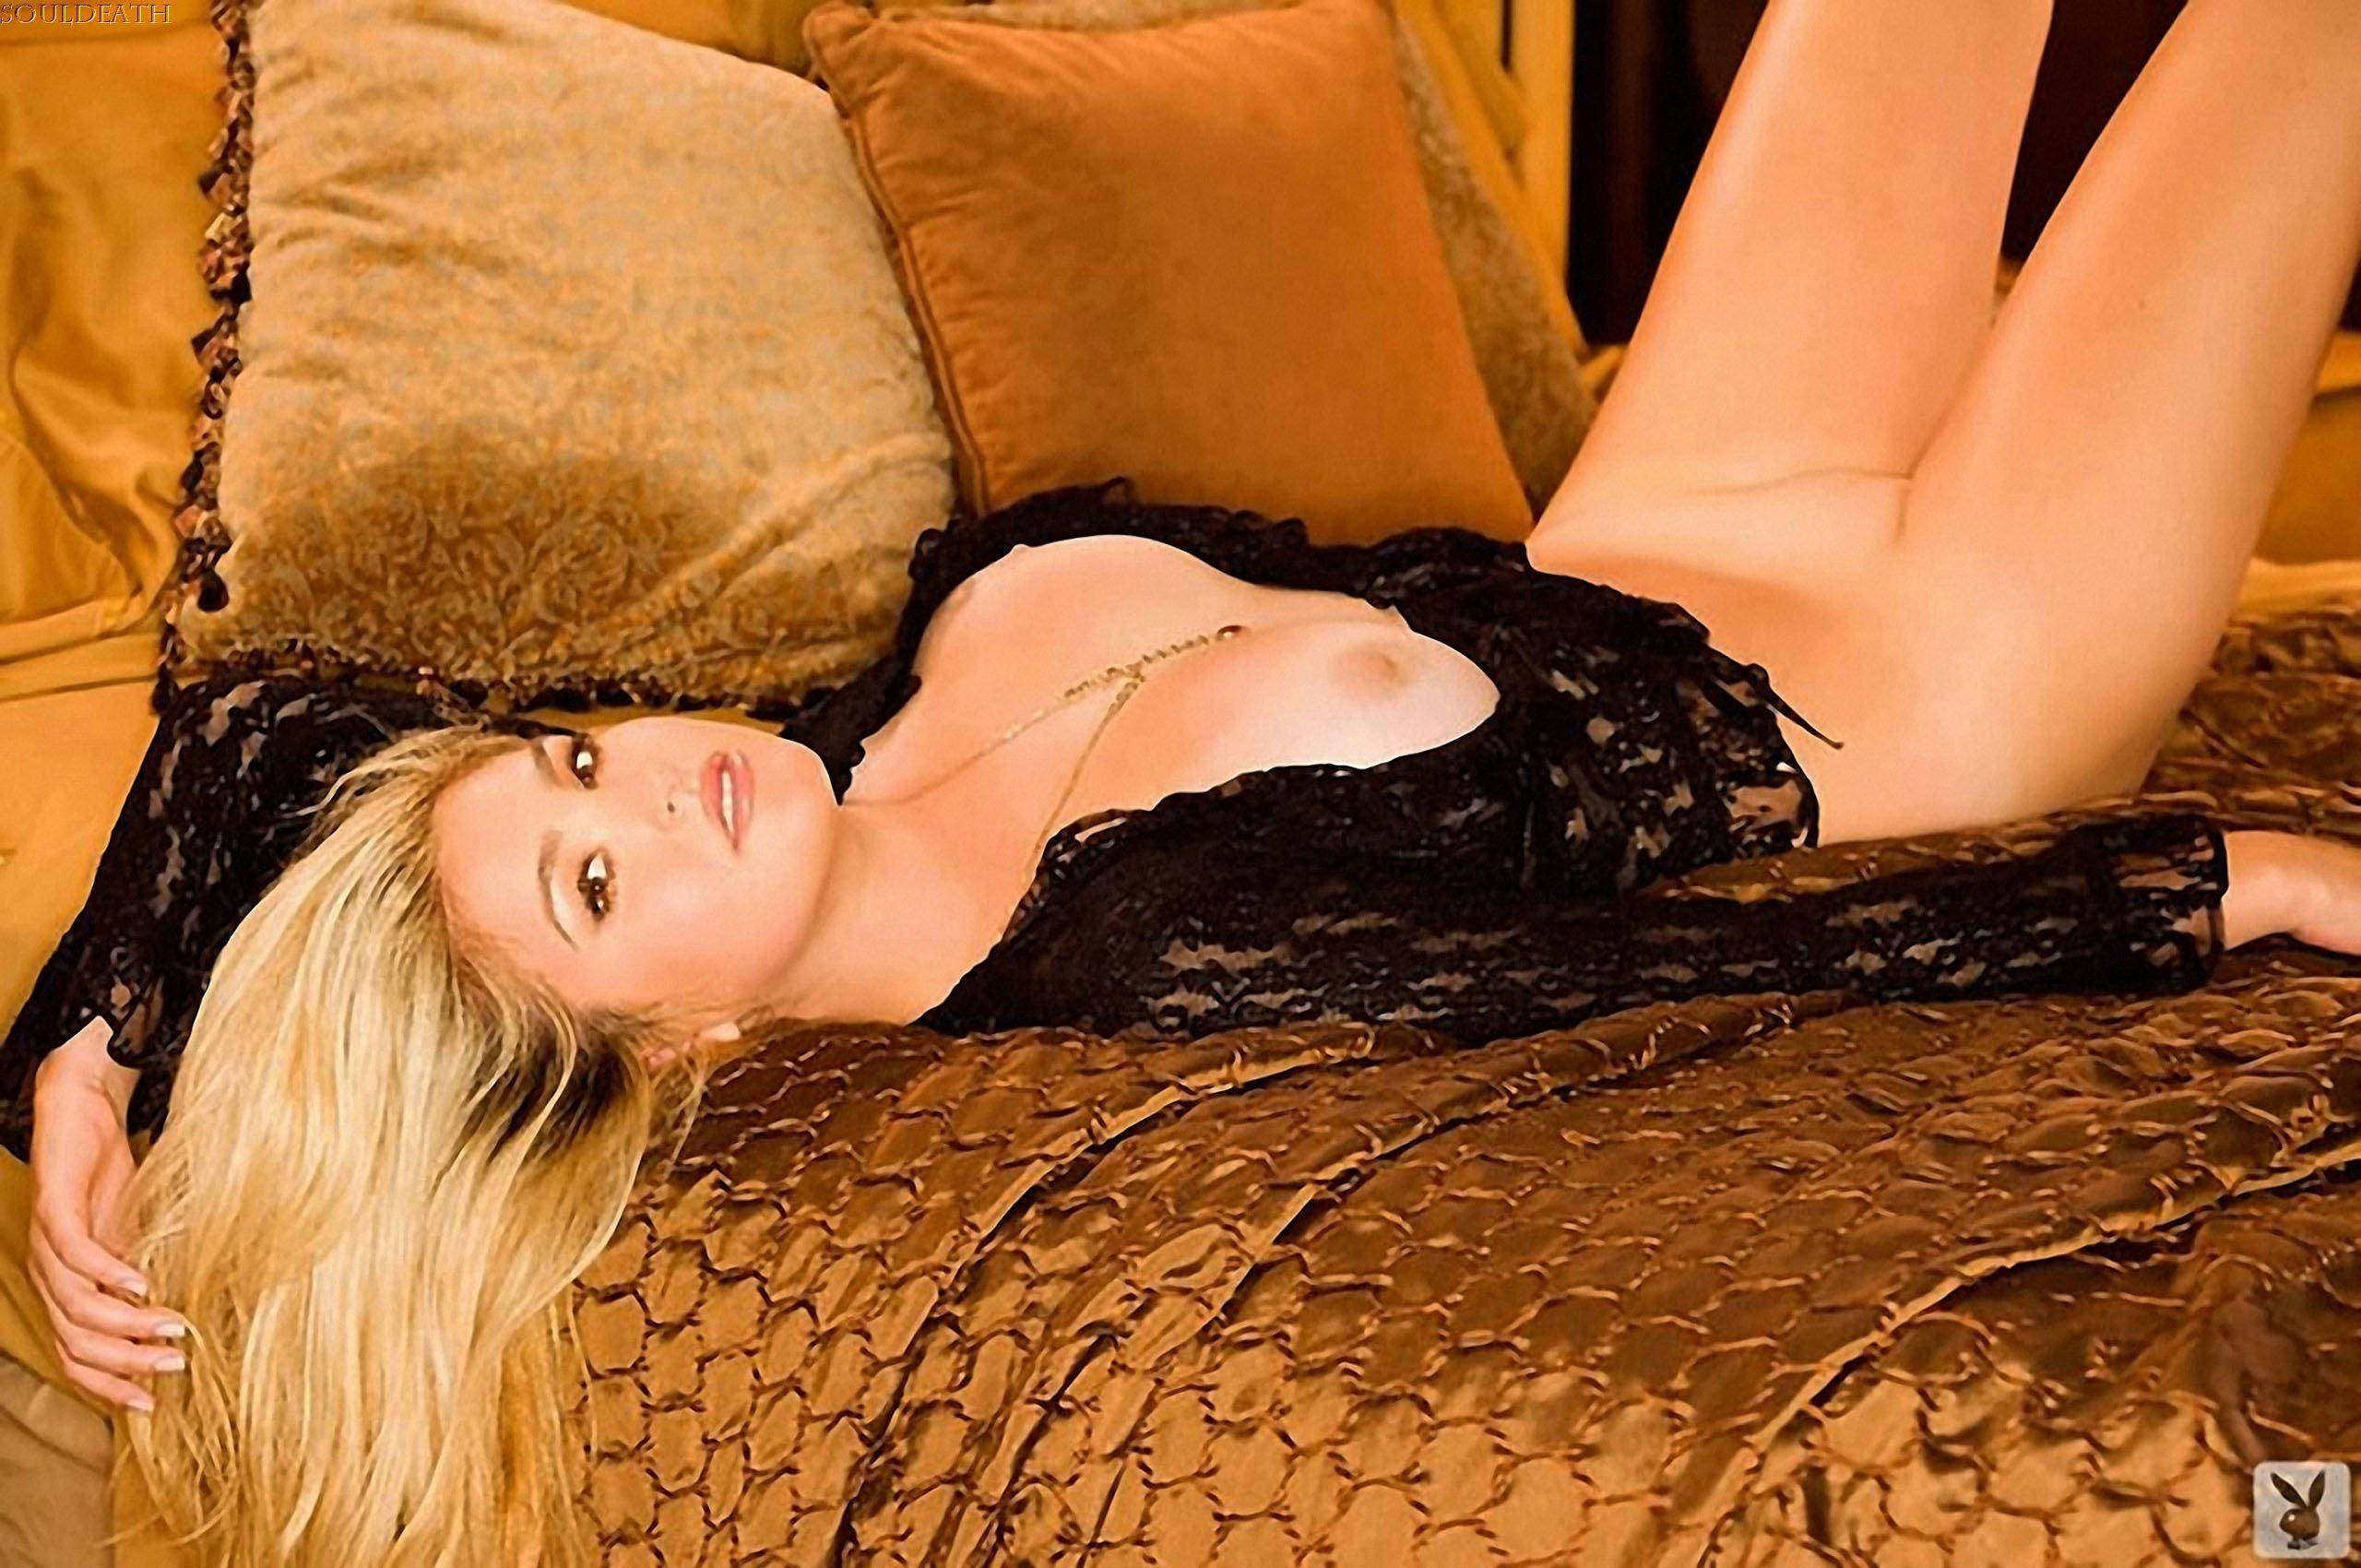 XXX Josie Goldberg nudes (34 photo), Pussy, Is a cute, Feet, braless 2020